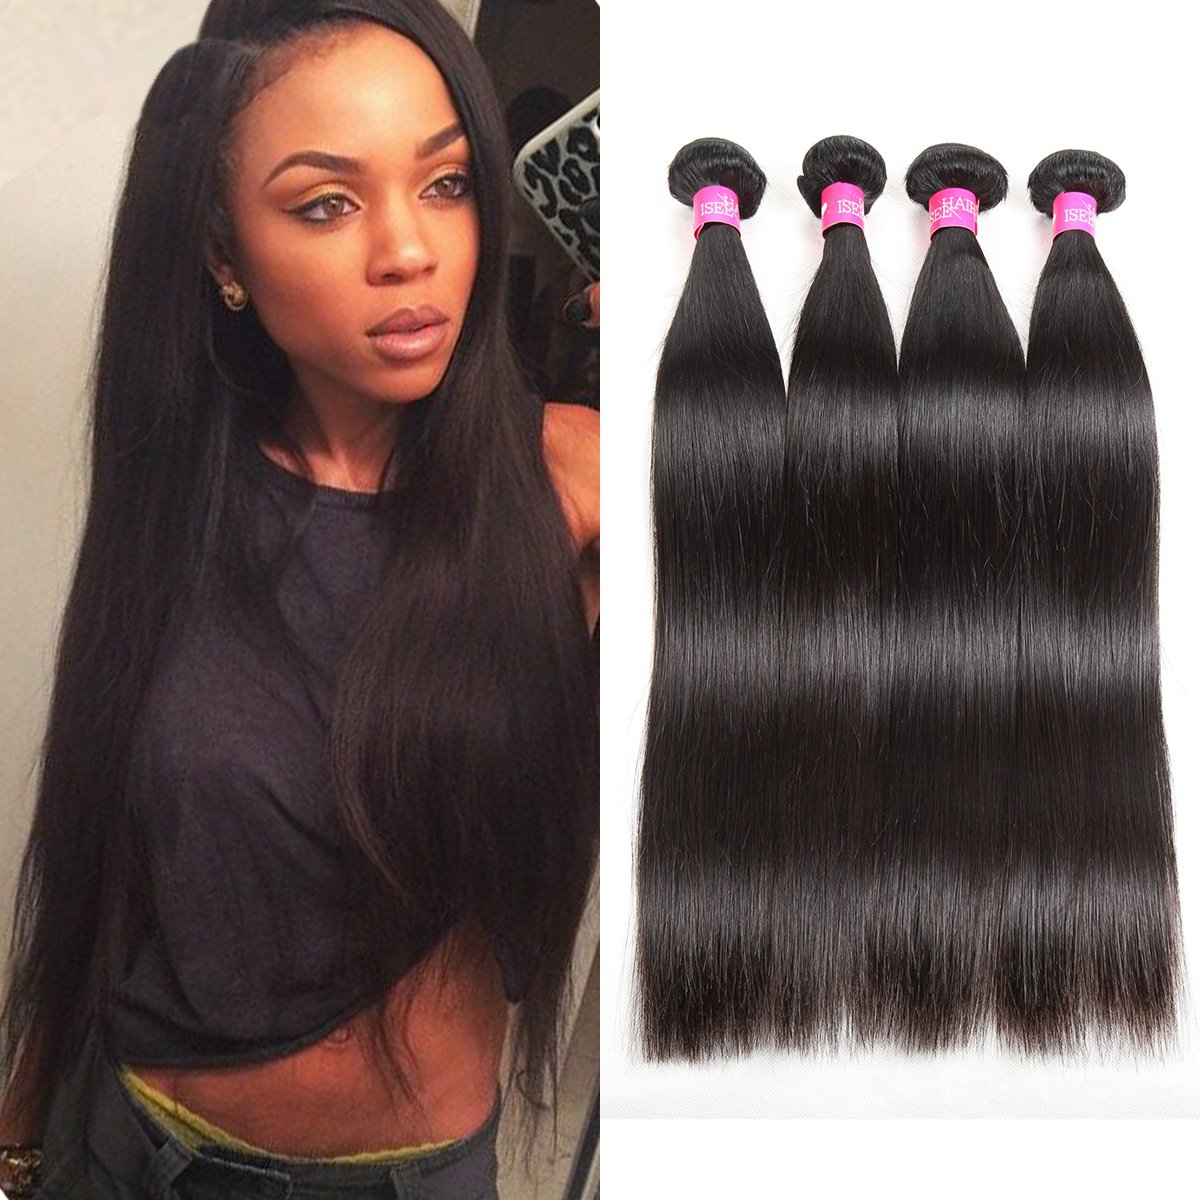 ISEE Hair 8A Malaysian Virgin Straight Hair 4 Bundles 100% Unprocessed Human Hair Weave Bundles Human Hair Extensions 4 Bundles Deal Natural Black 20 20 22 22inches